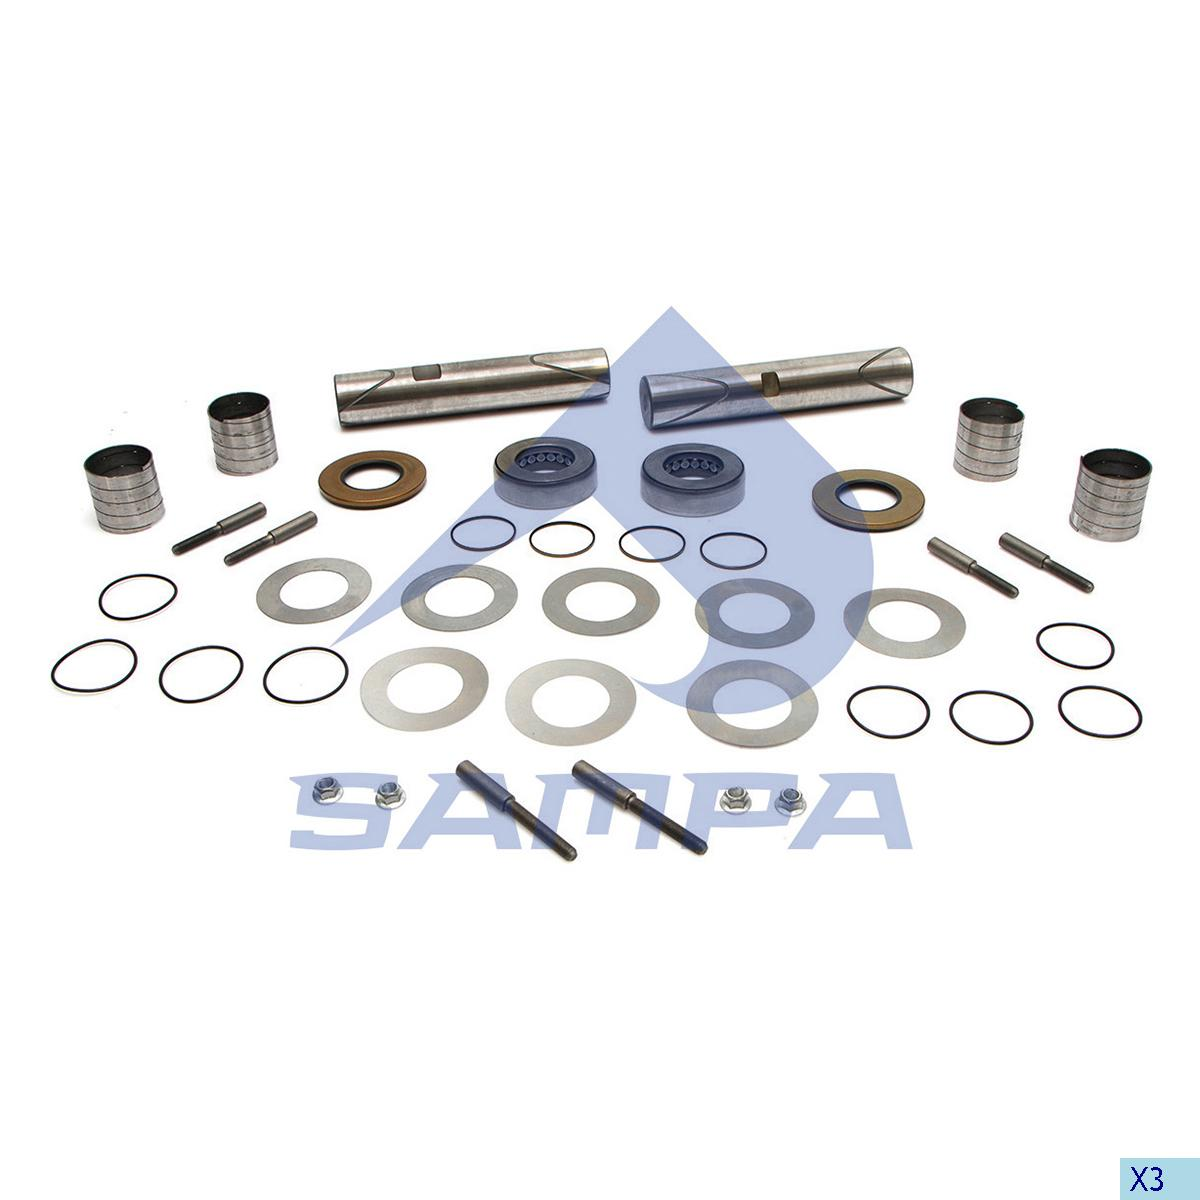 King Pin Kit, Axle Steering Knuckle, Kaiser, Power Unit